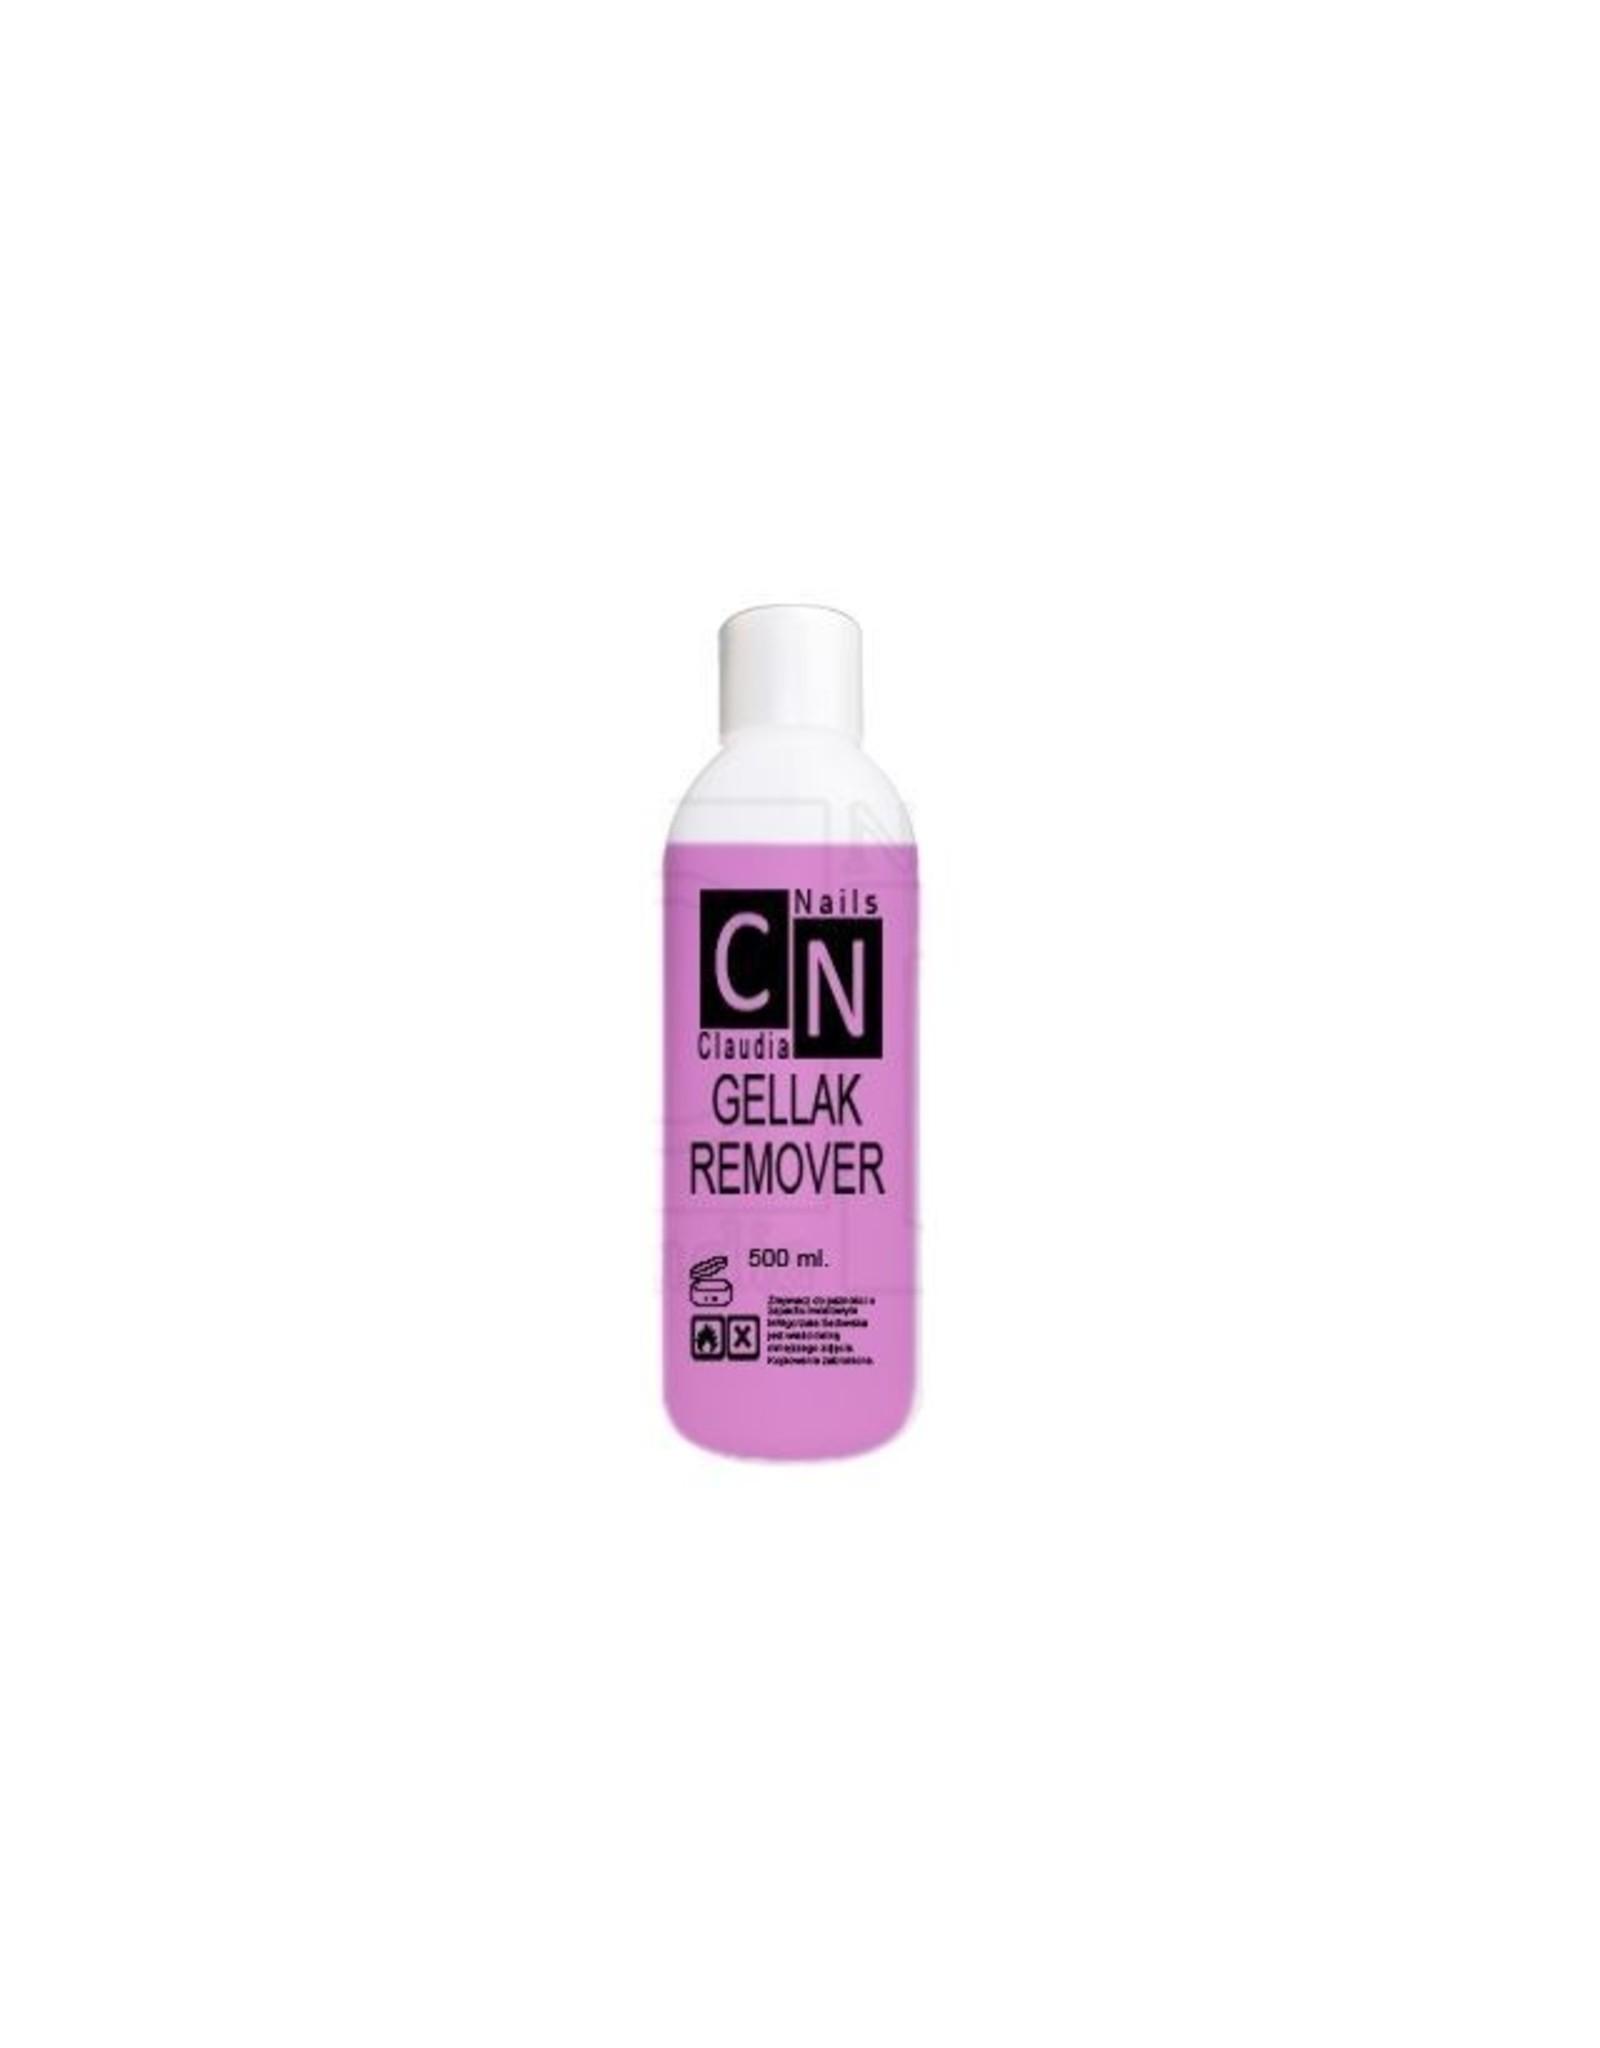 ClaudiaNails Gellak Remover 500 ml